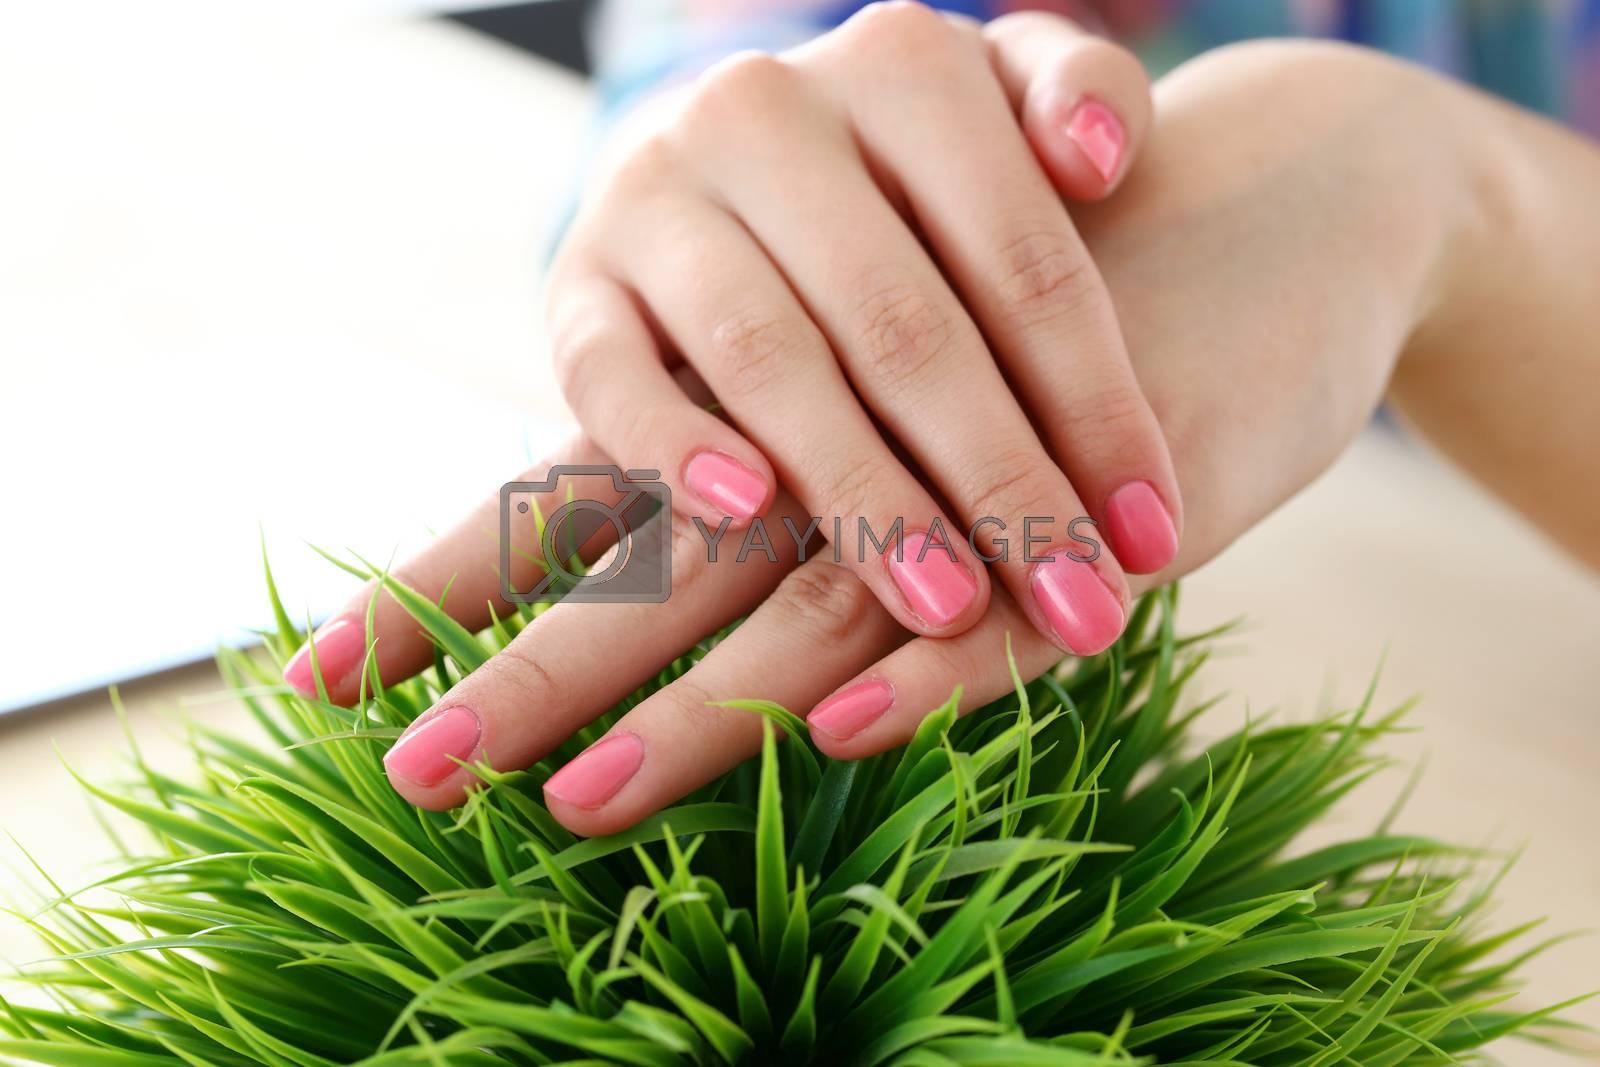 Beautiful, soft hands by rufatjumali